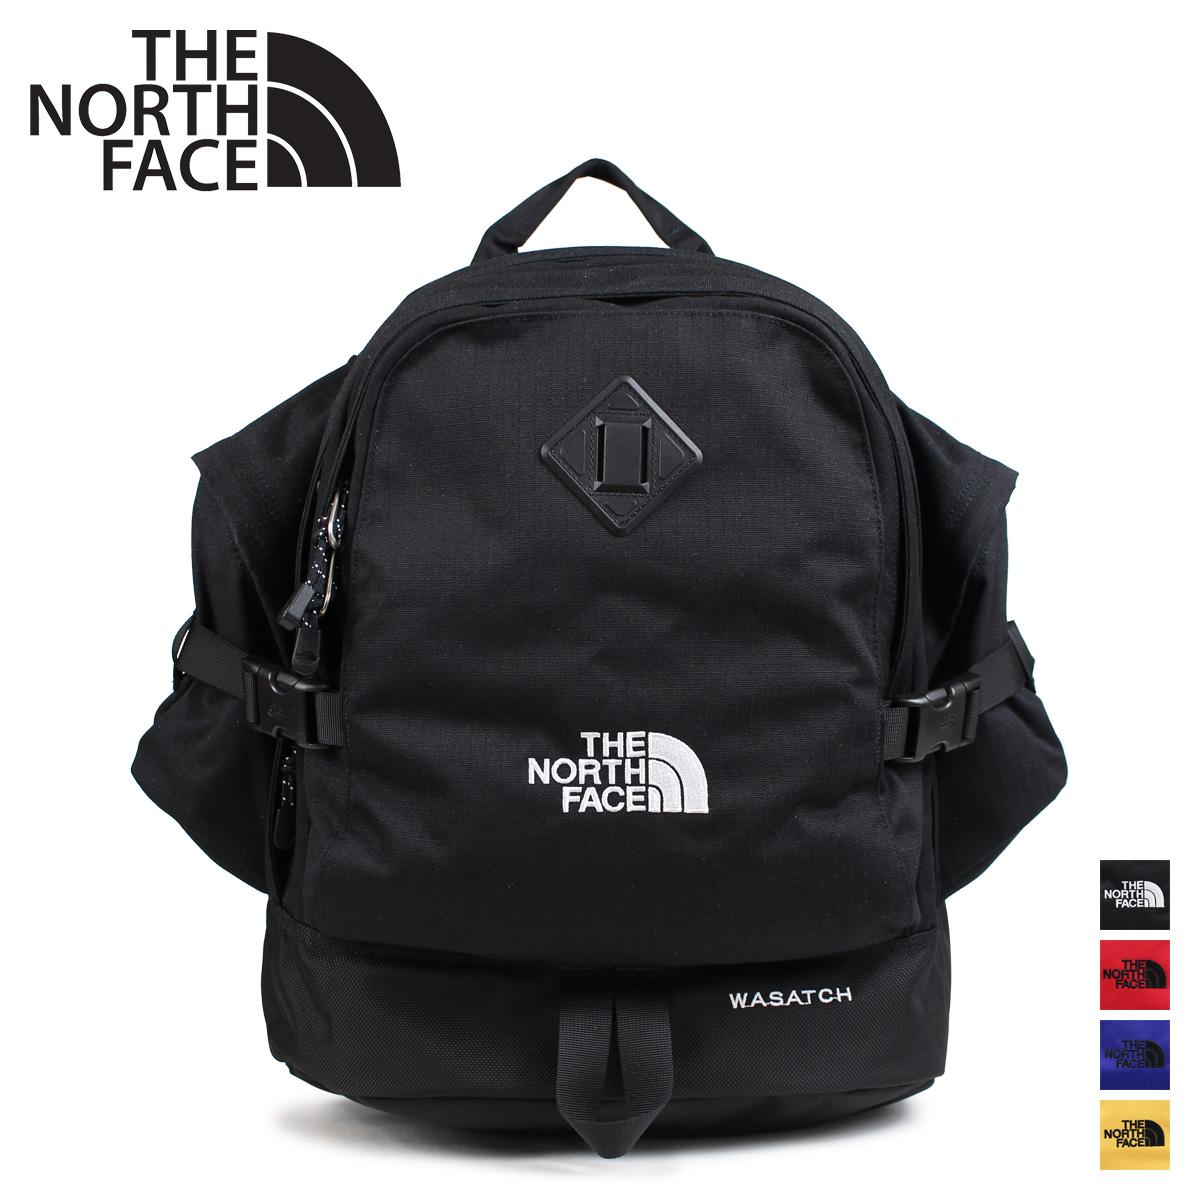 THE NORTH FACE ノースフェイス リュック メンズ レディース バックパック ワサッチ WASATCH NM71860 [10/18 新入荷]